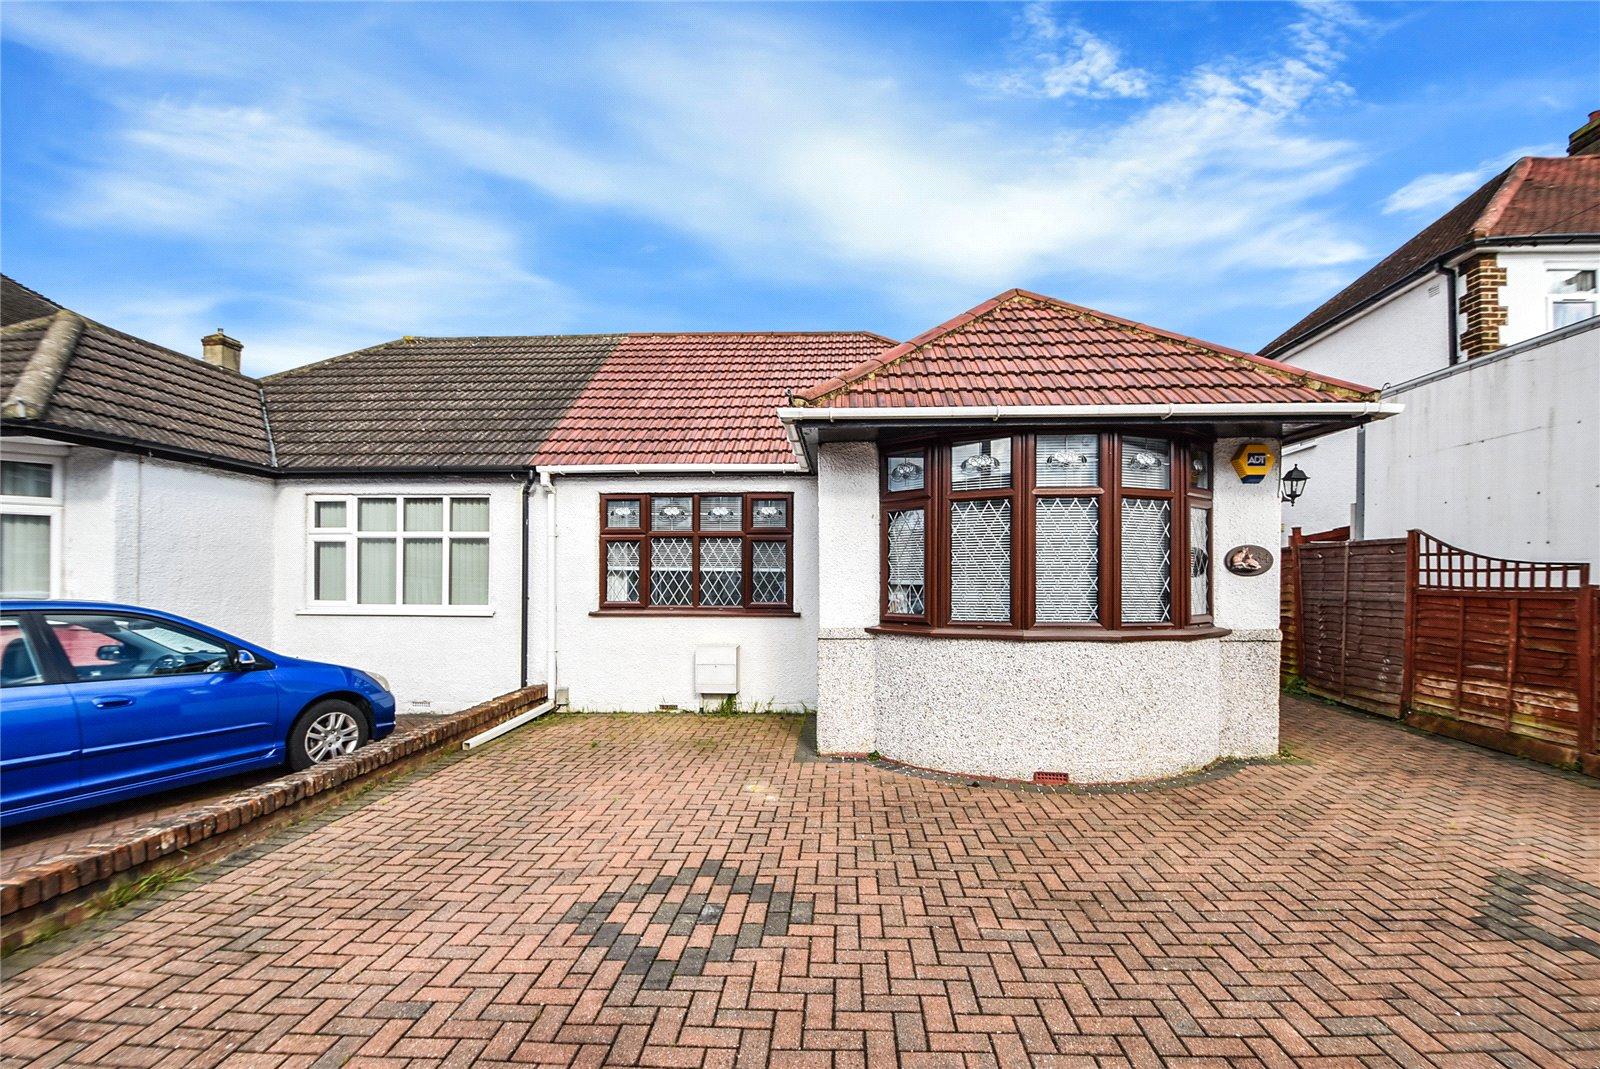 Seaton Road, West Dartford, Kent, DA1